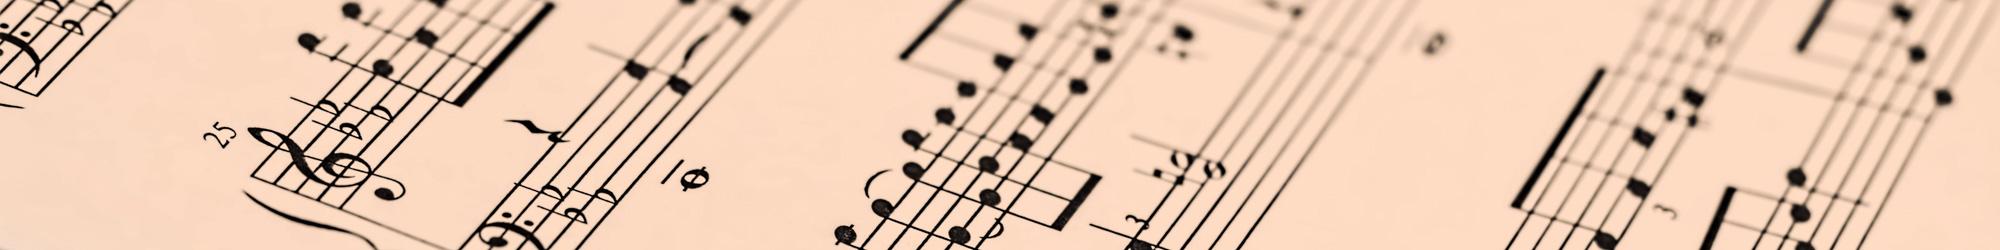 Musik - Noten auf rosa Papier